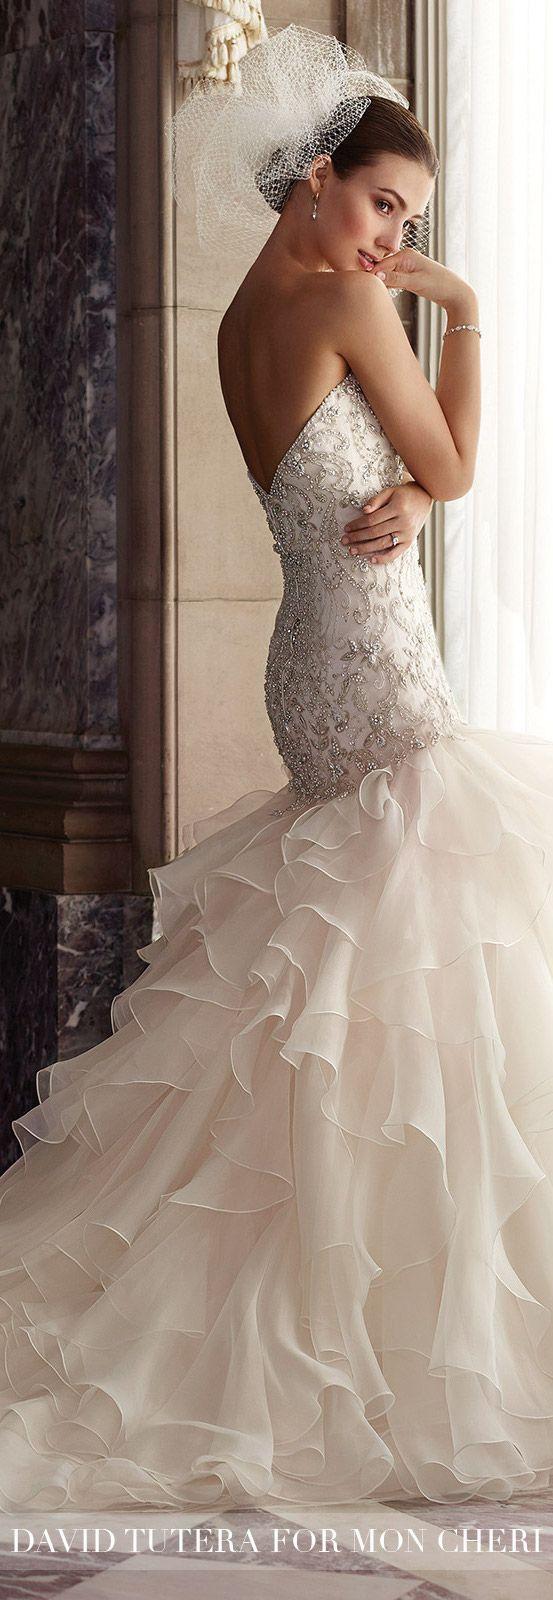 Wedding Dresses:   Illustration   Description   Wedding Dress by David Tutera for Mon Cheri 2017 Bridal Collection | Style No. » 117277 Dior    -Read More –   - #WeddingDresses https://adlmag.net/2017/12/20/wedding-dresses-inspiration-wedding-dress-by-david-tutera-for-mon-cheri-2017-bridal-collection-style-no-5/